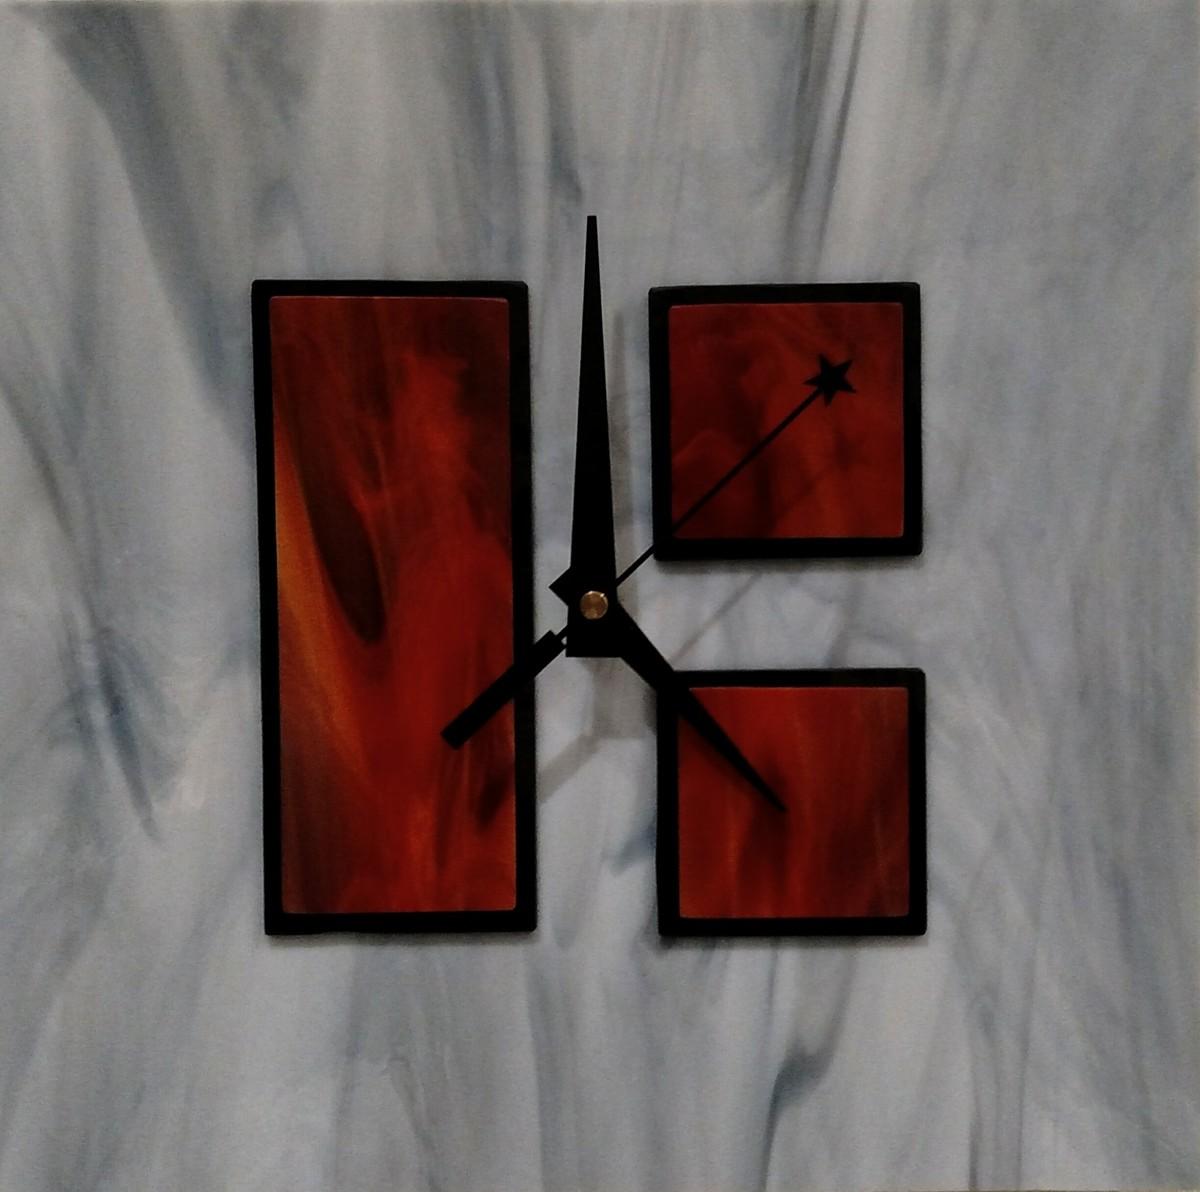 Art glass clock (large view)